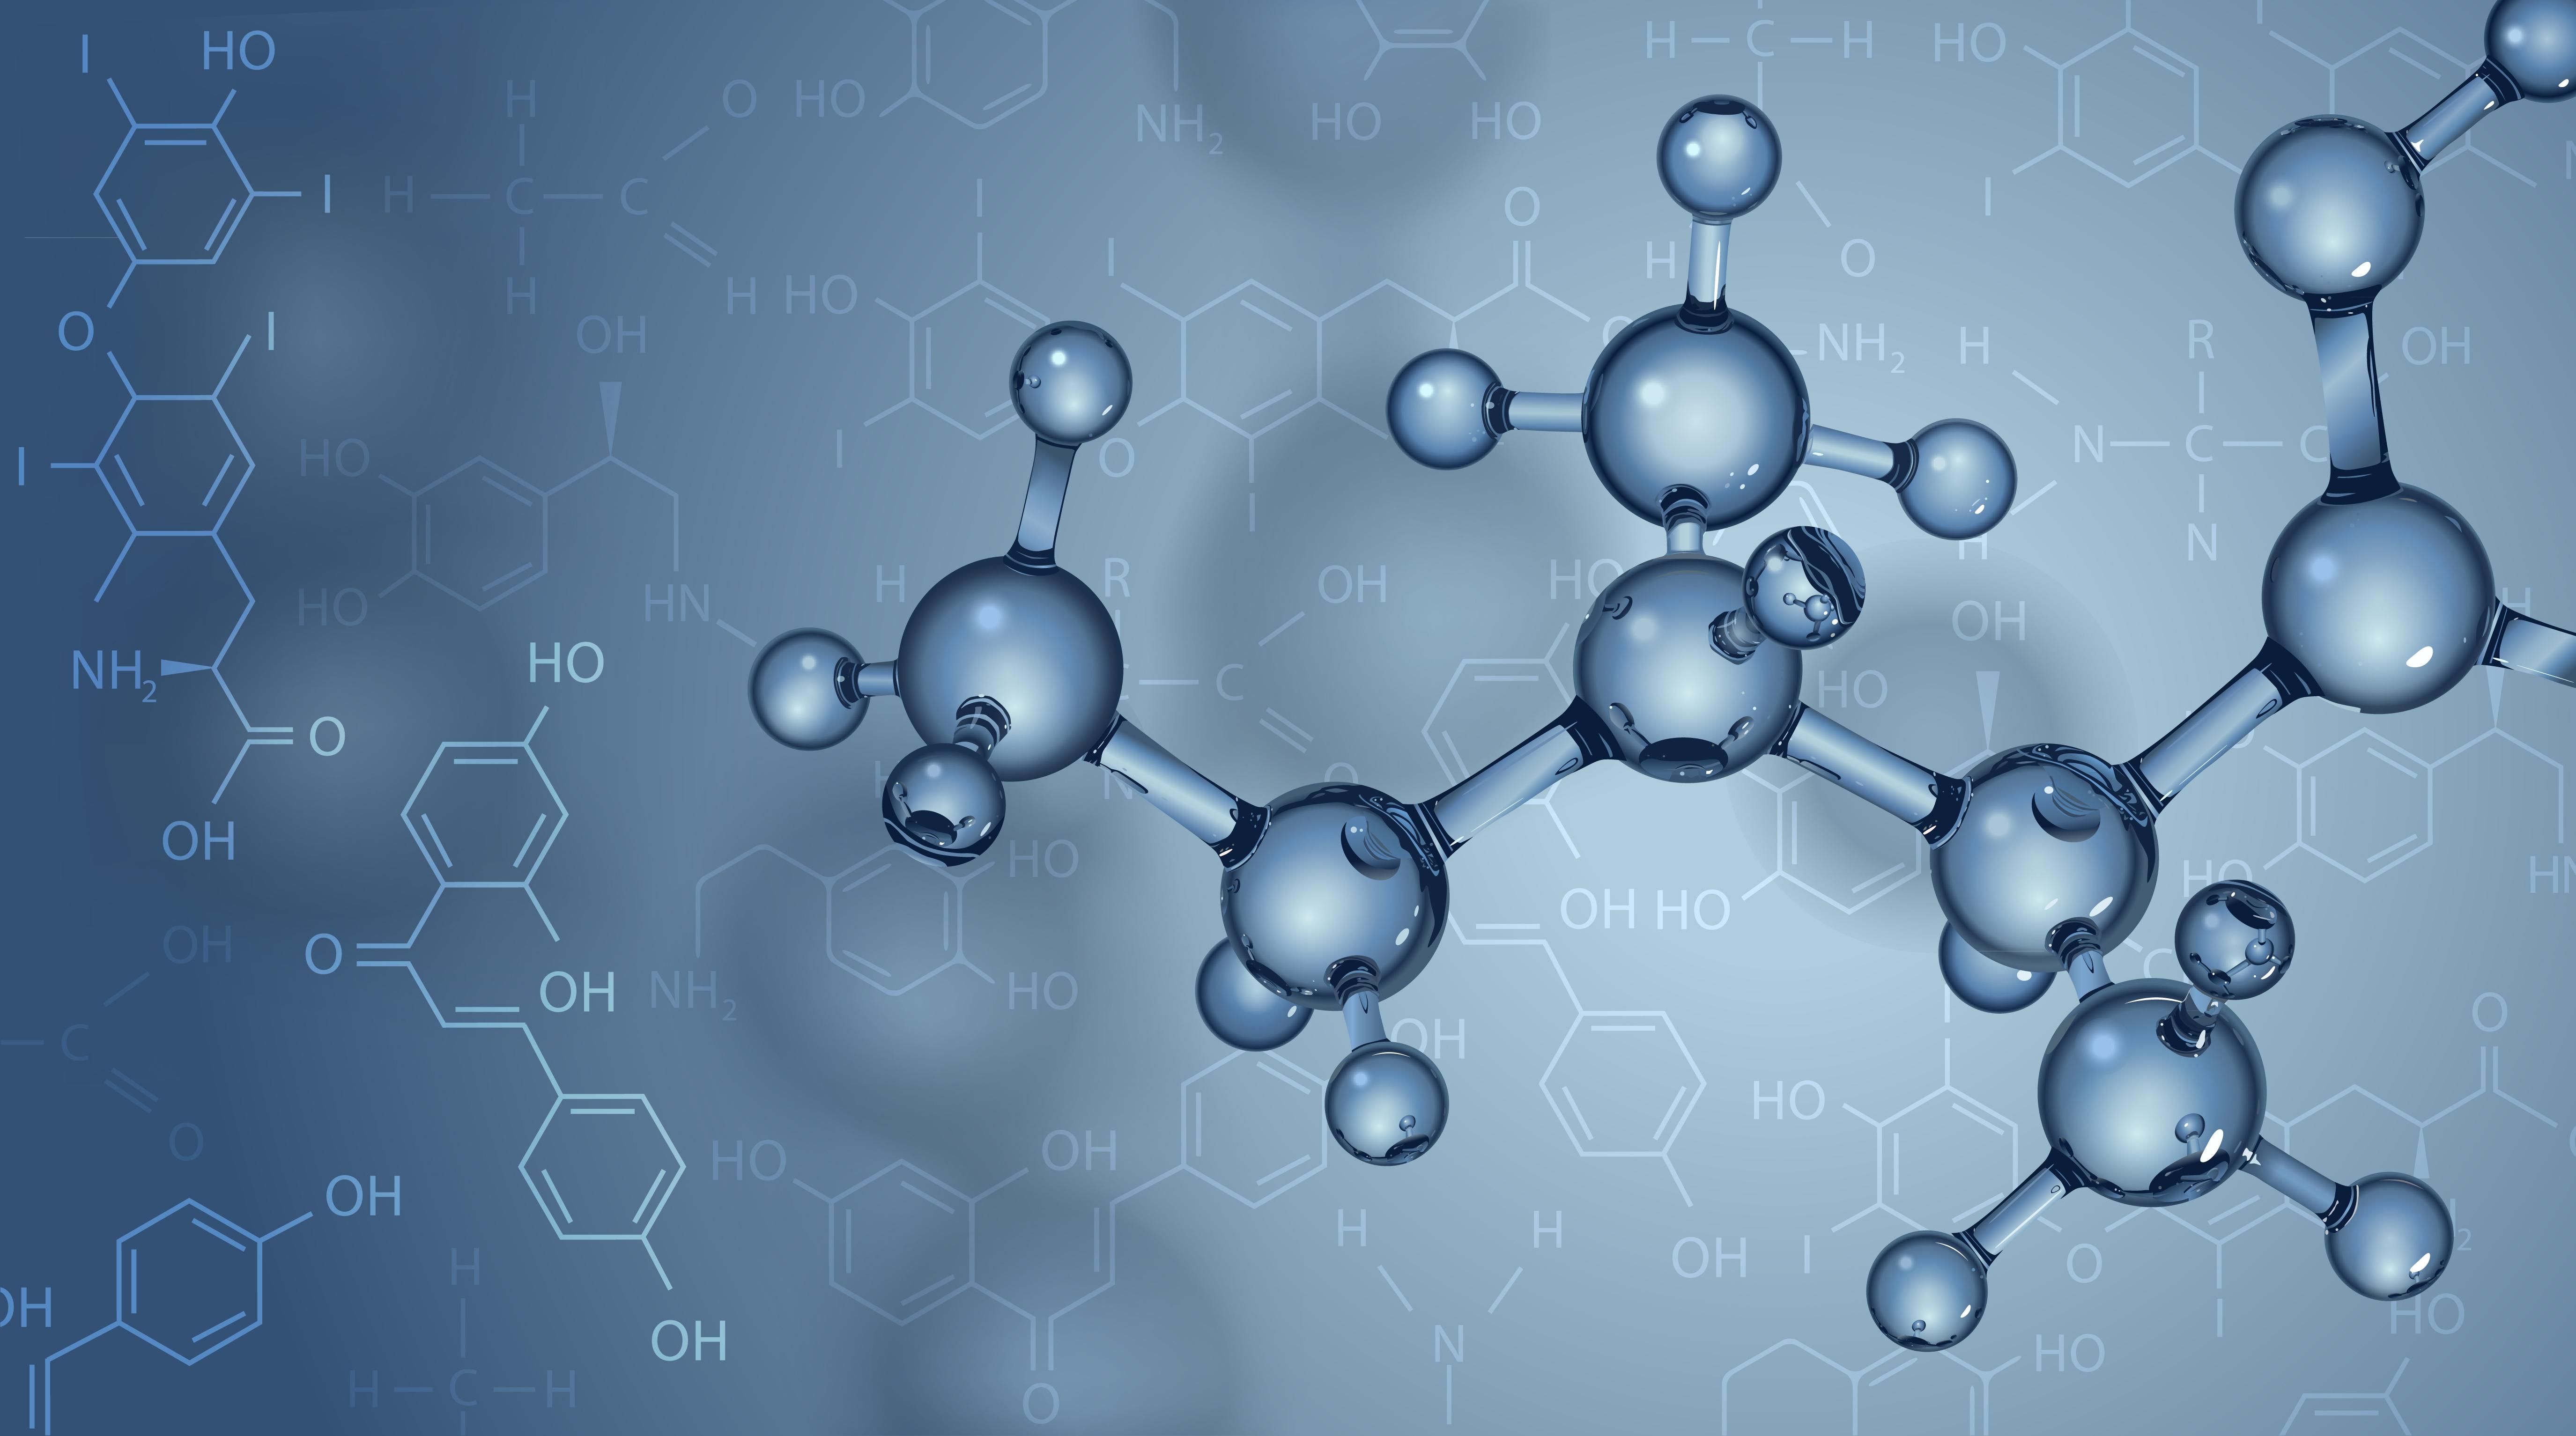 Chimica bella e chimica brutta – Scientificast #126